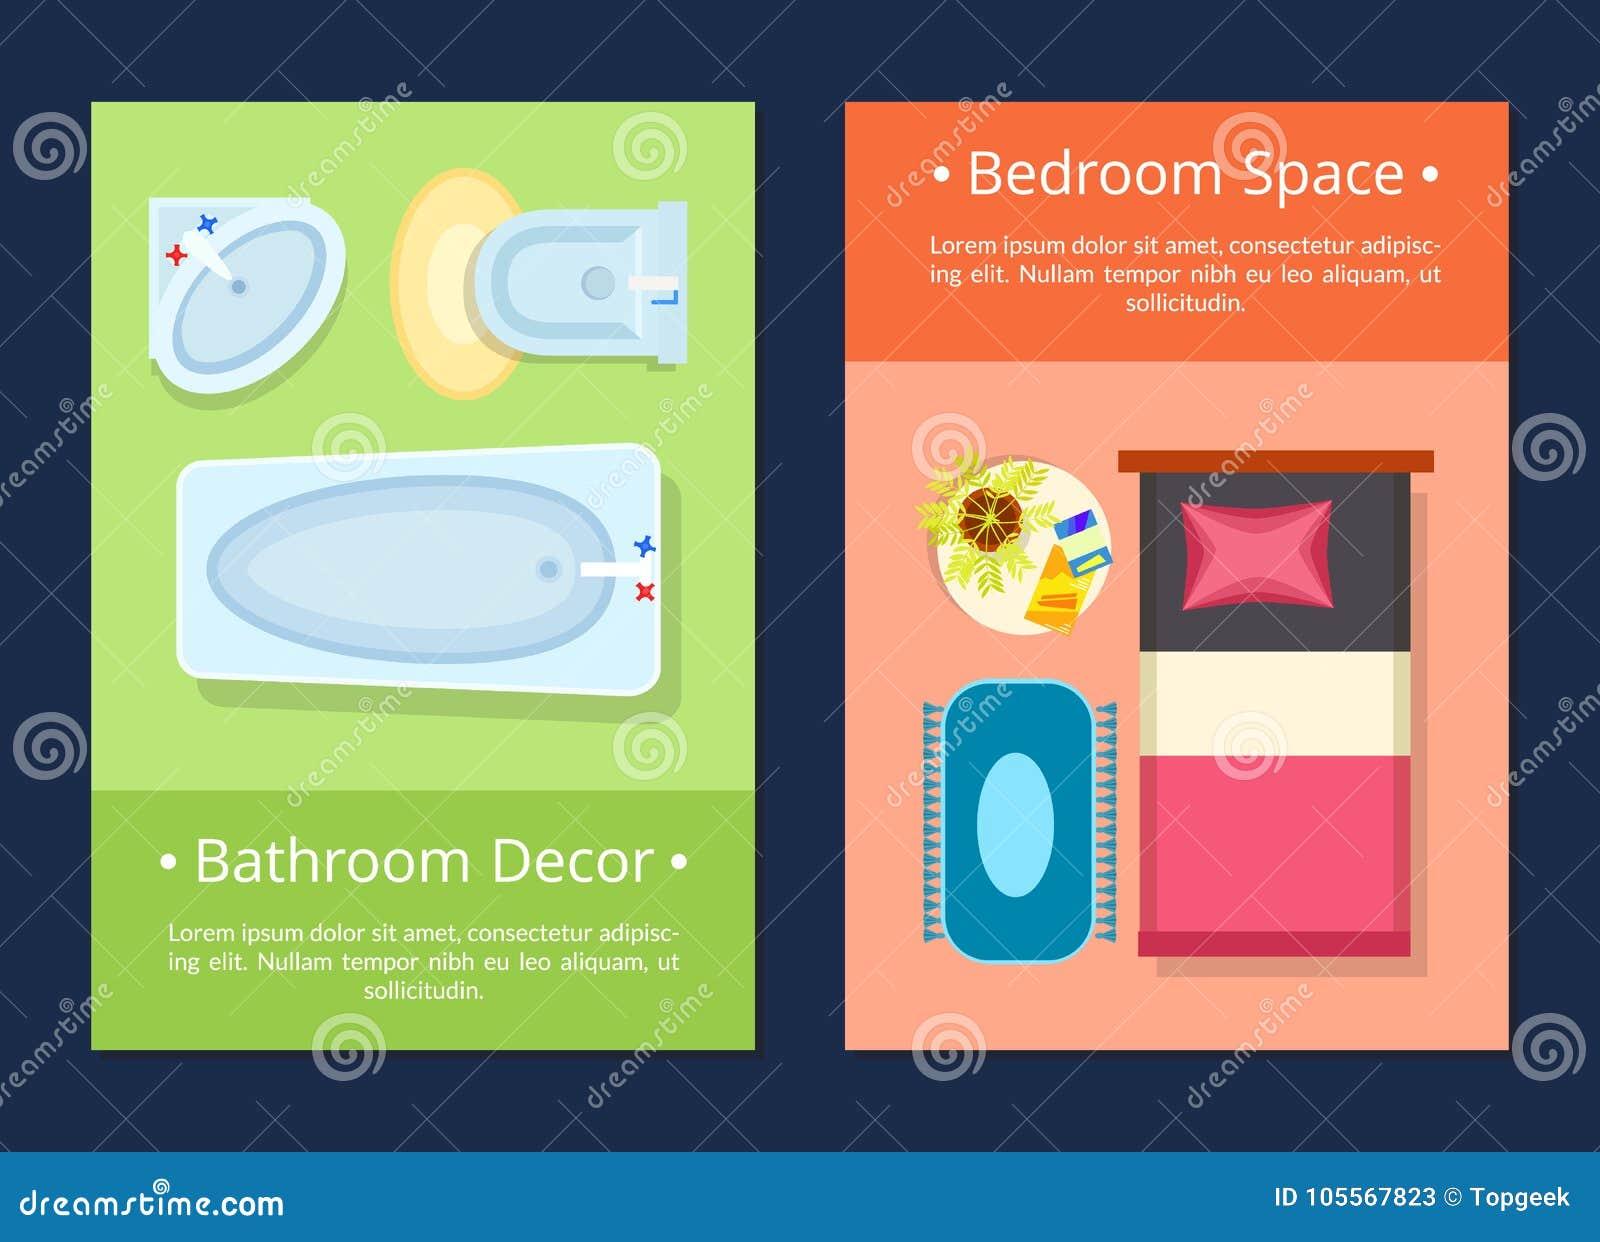 Bathroom Decor Bedroom Space Vector Illustration Stock Vector ...